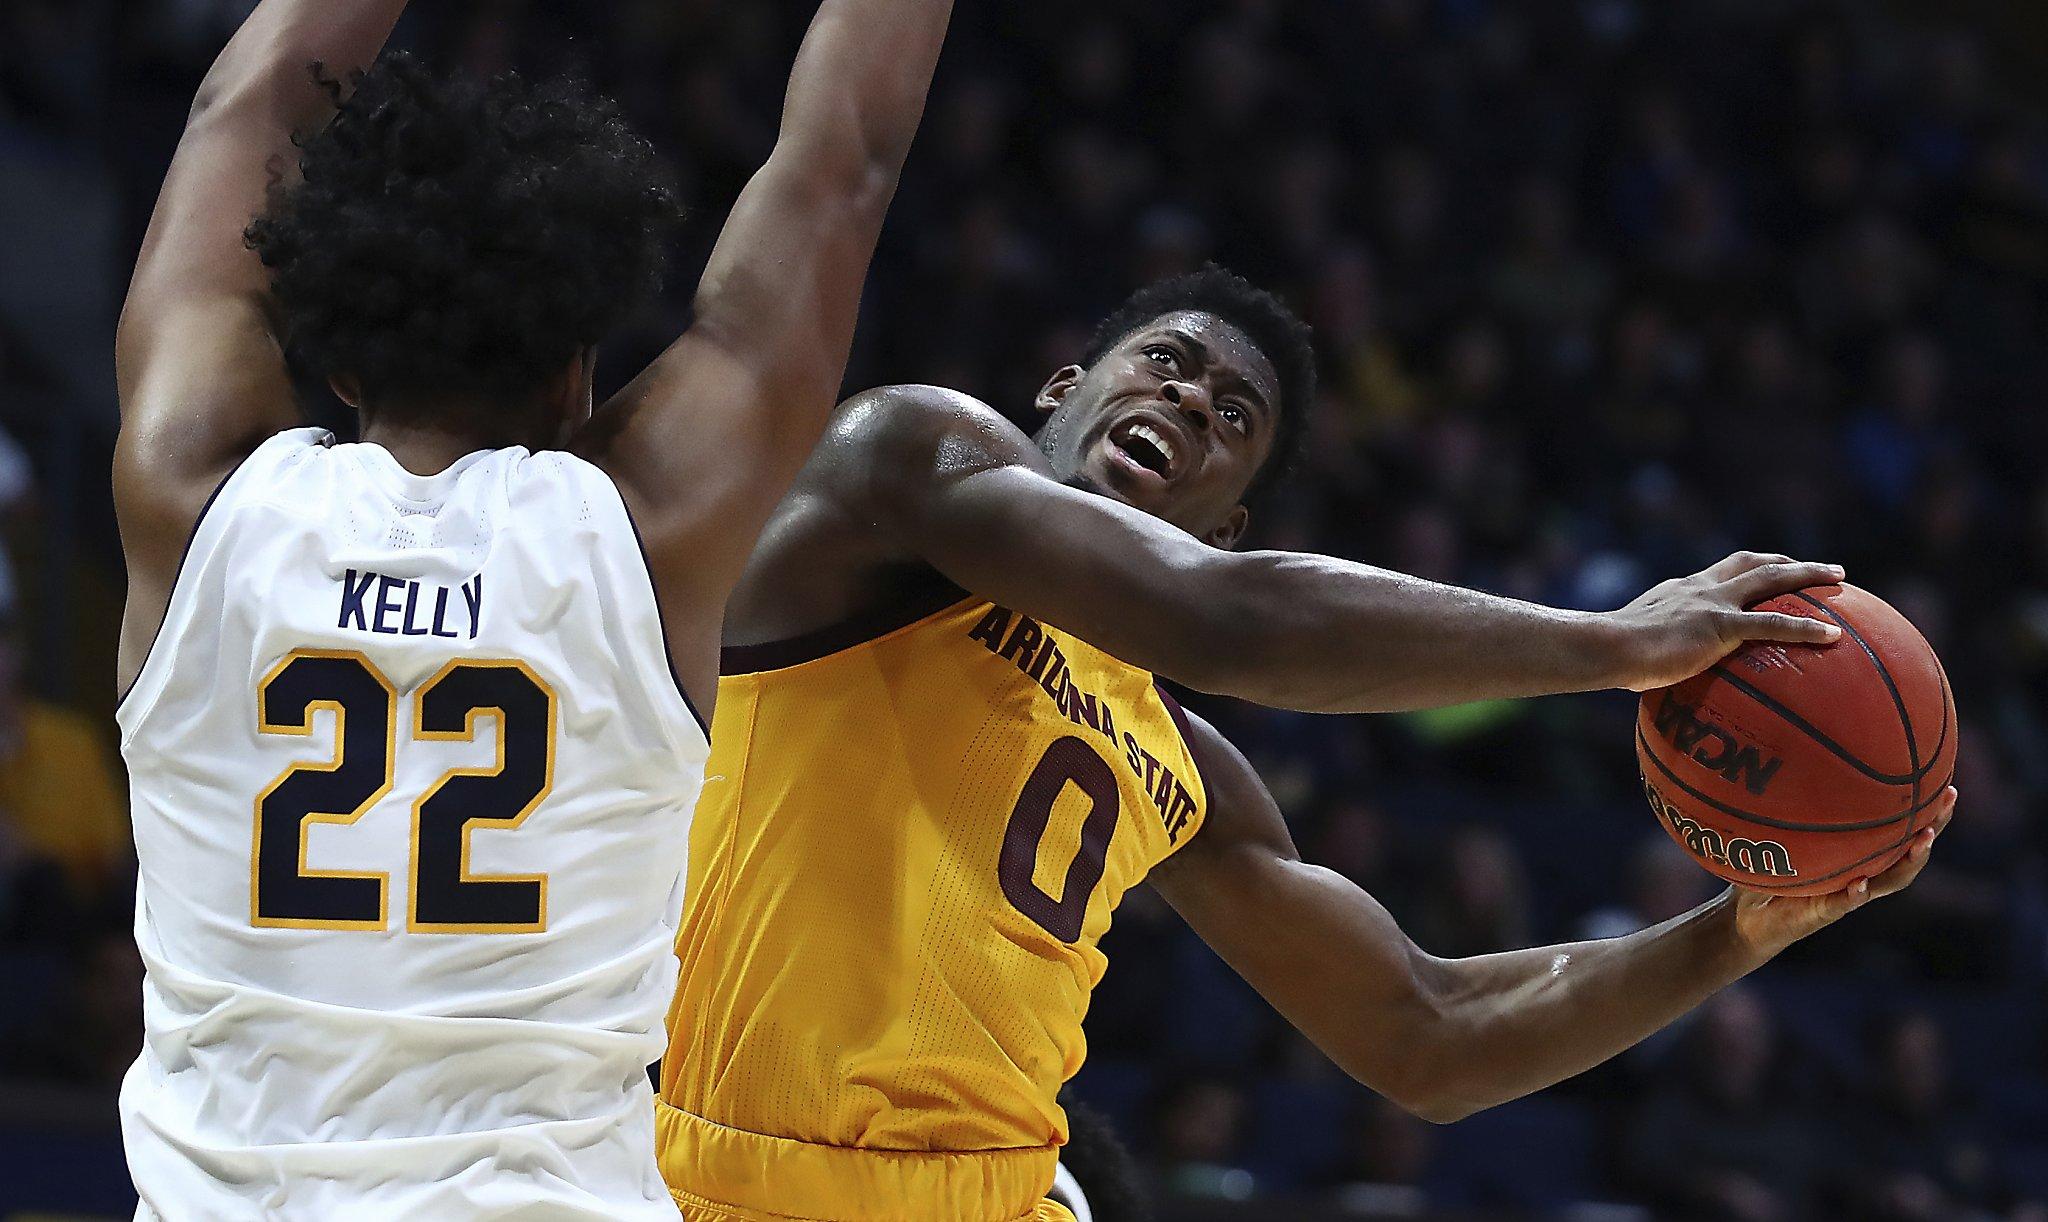 Cal men's basketball runs losing streak to four games vs. Arizona State - SFGate